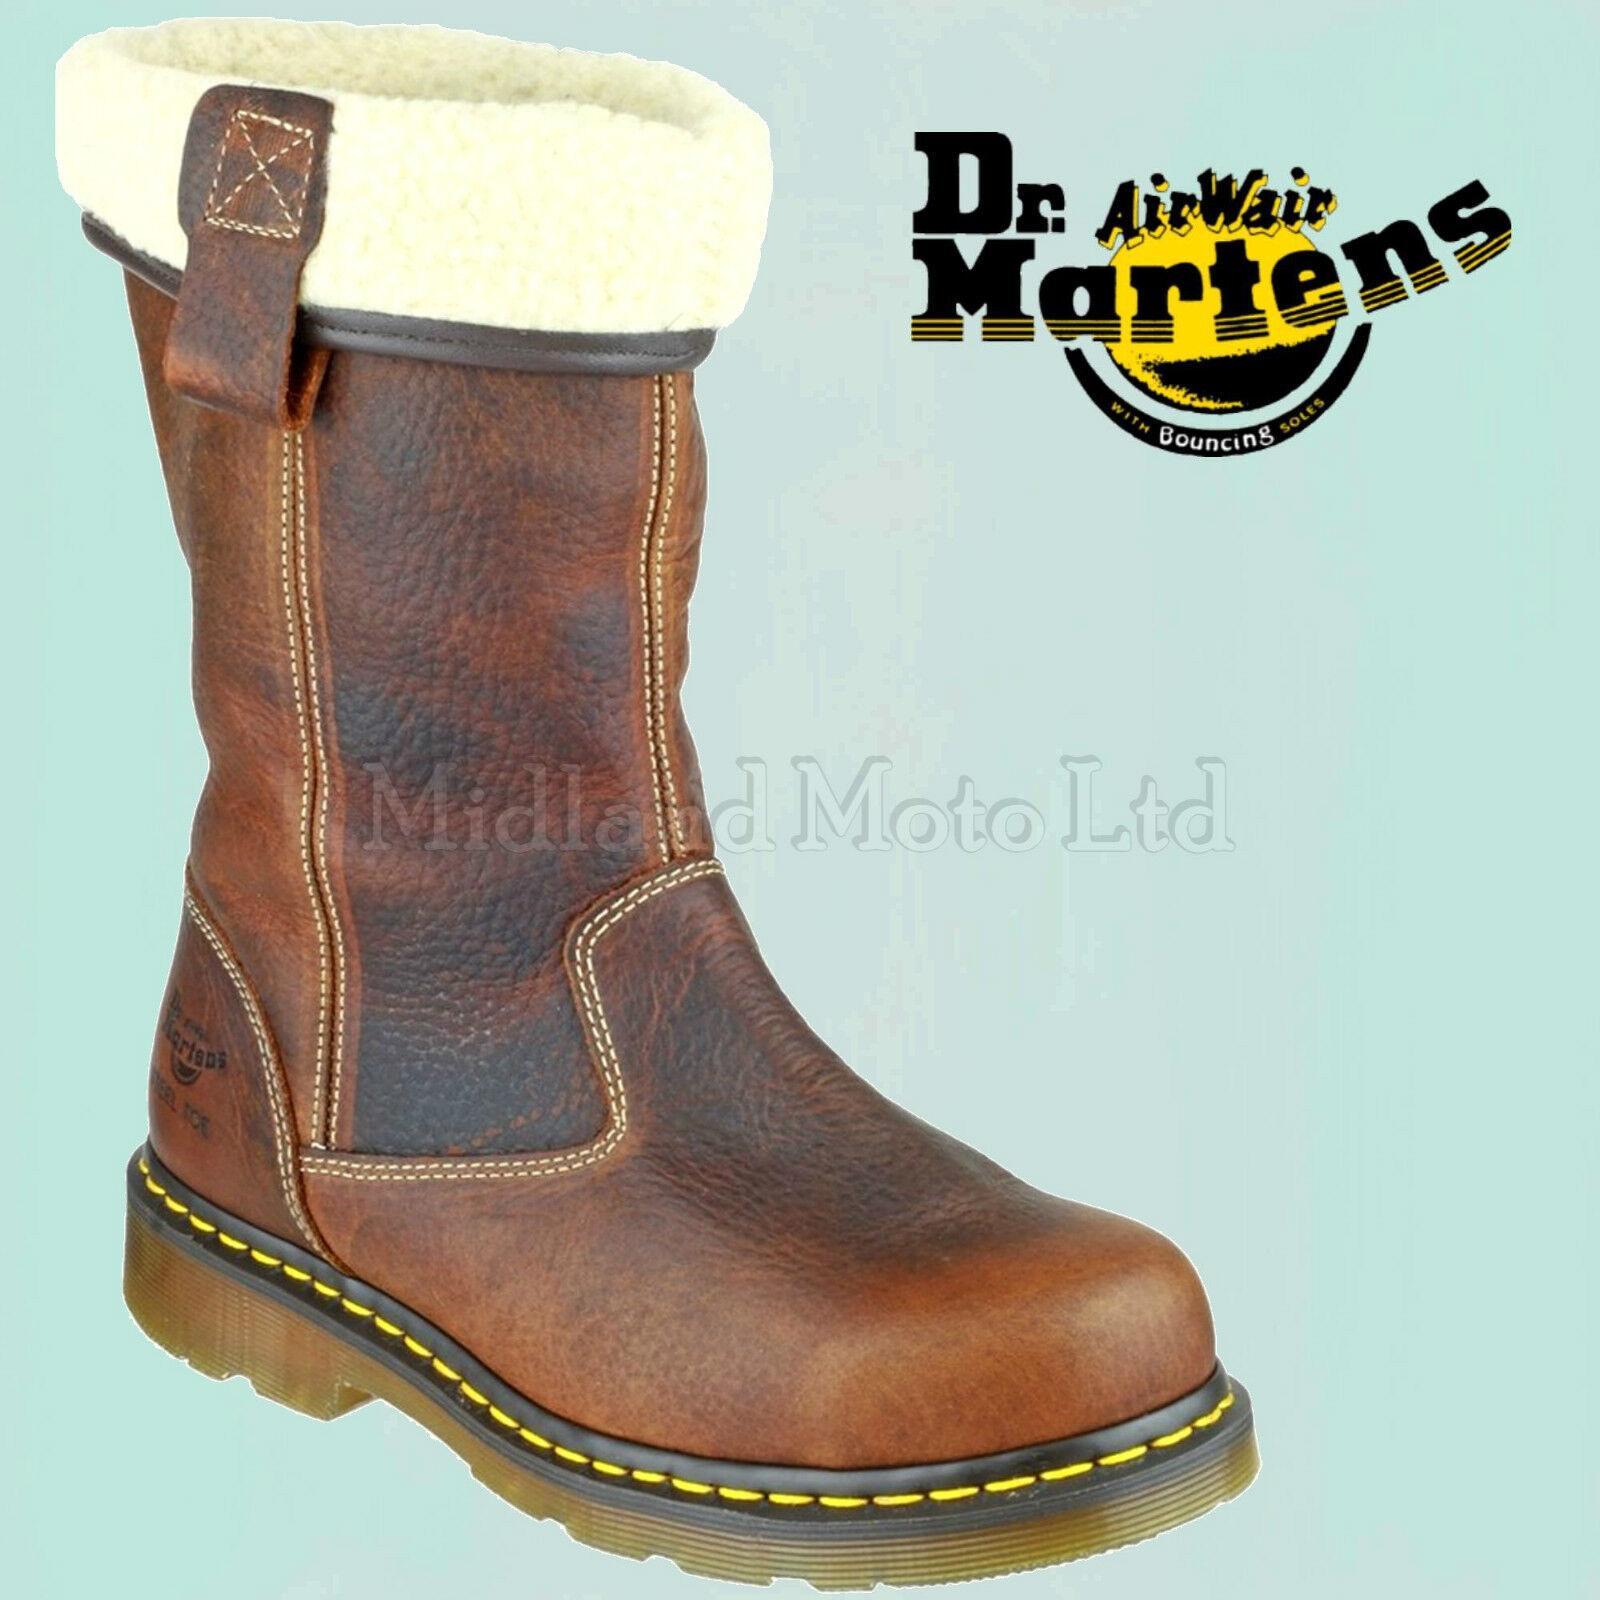 869e22fcc8c Dr Martens Steel Toe cap Ladies Rosa ST Rigger Safety Boot 6807 DM